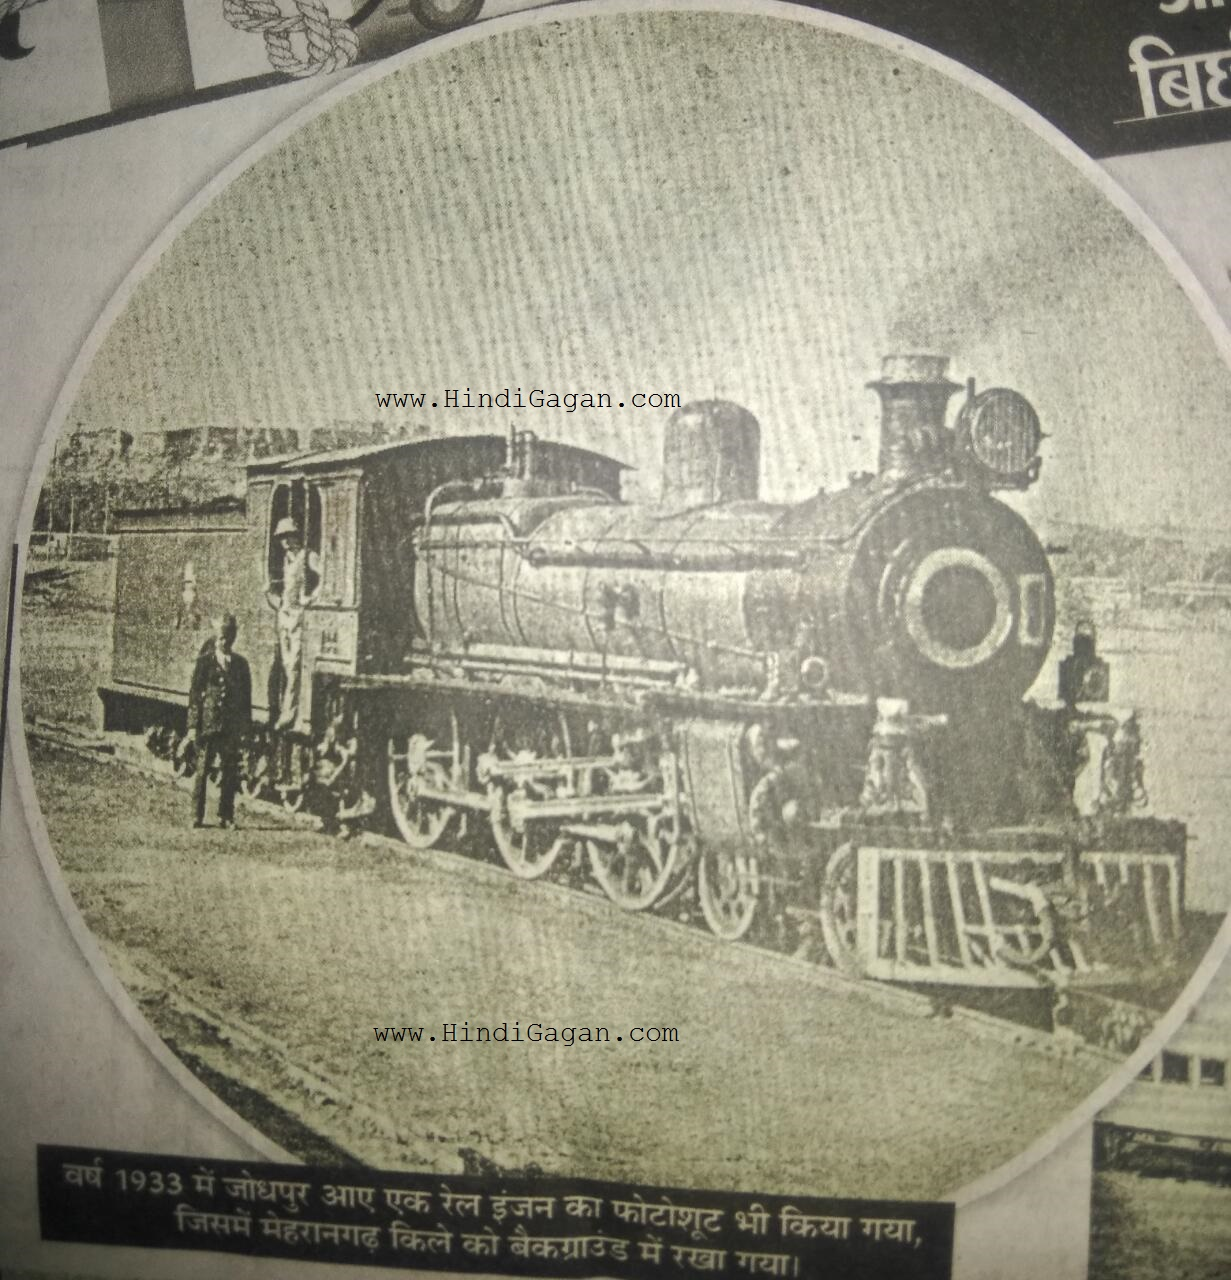 Old Image of Jodhpur meter Gage line